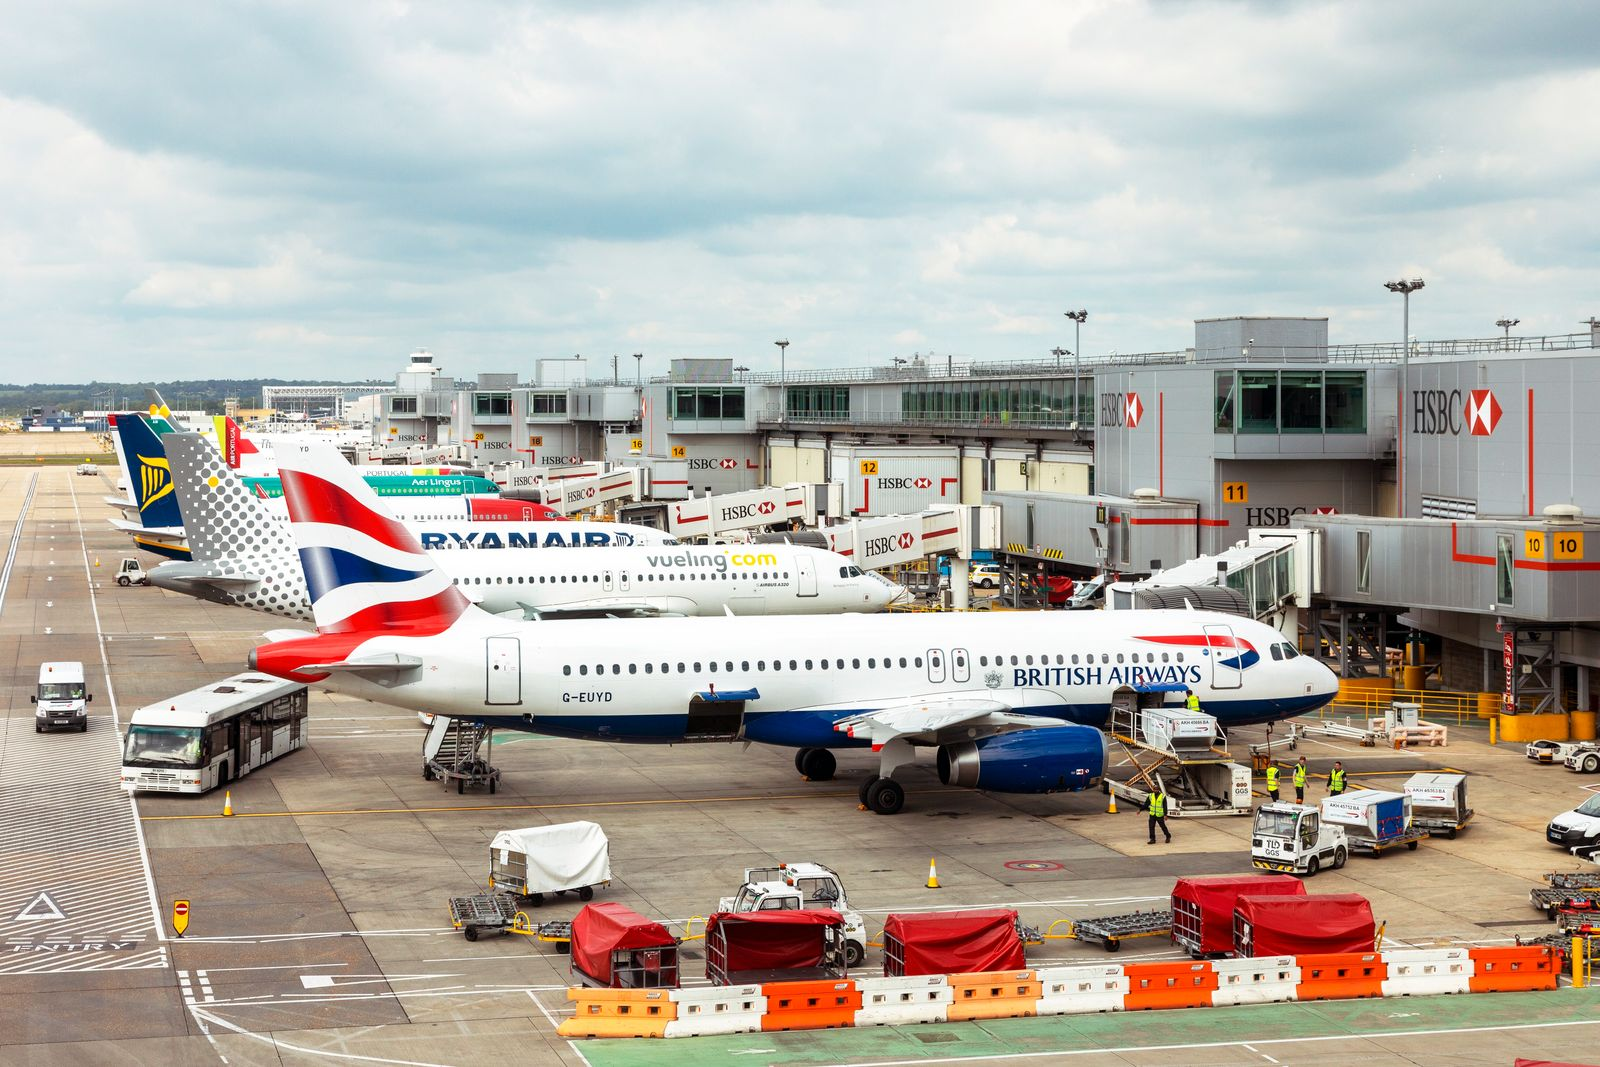 British Airways Airbus A320-232 registered G-EUYD being loaded at London Garwick airport, London, England, UK. (Findlay Rankin)